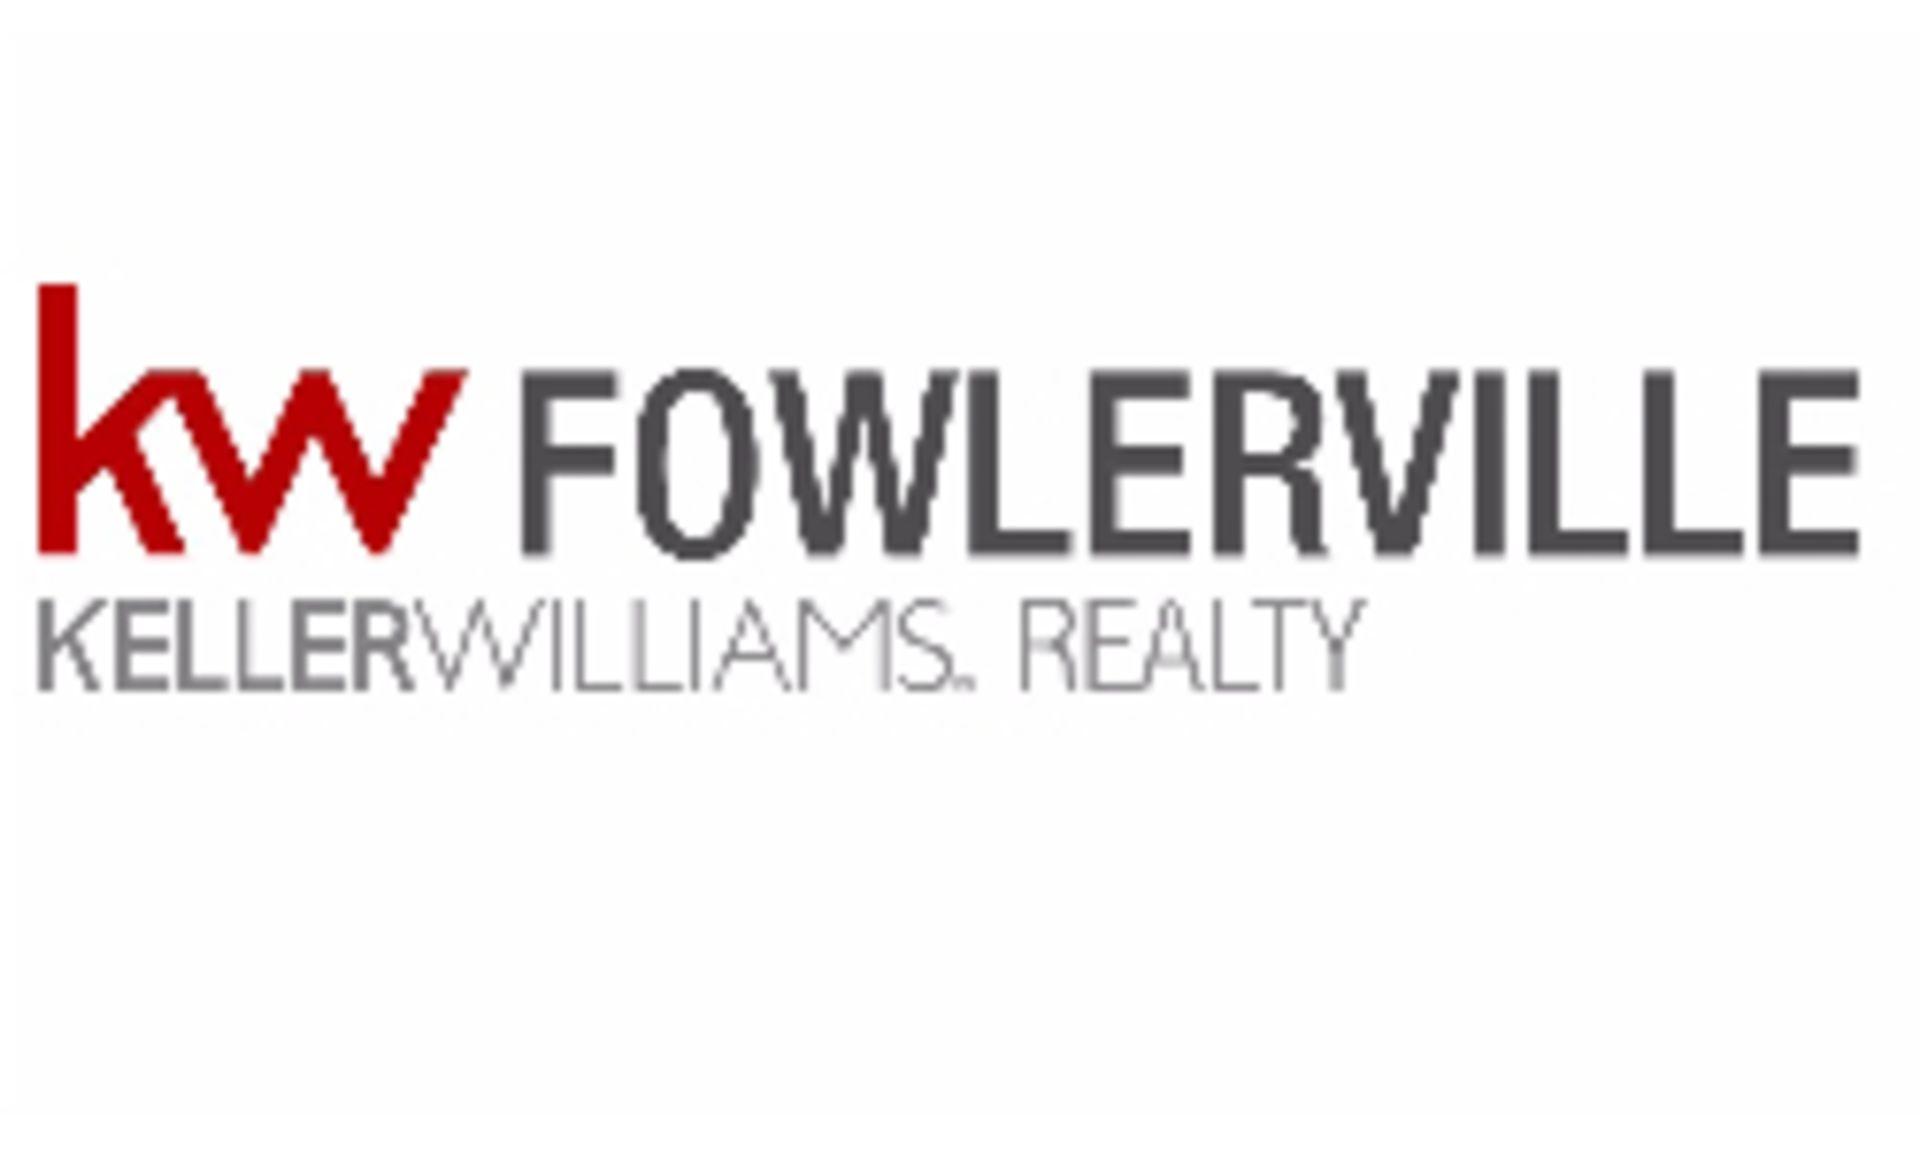 Fowlerville Keller Williams Realtors